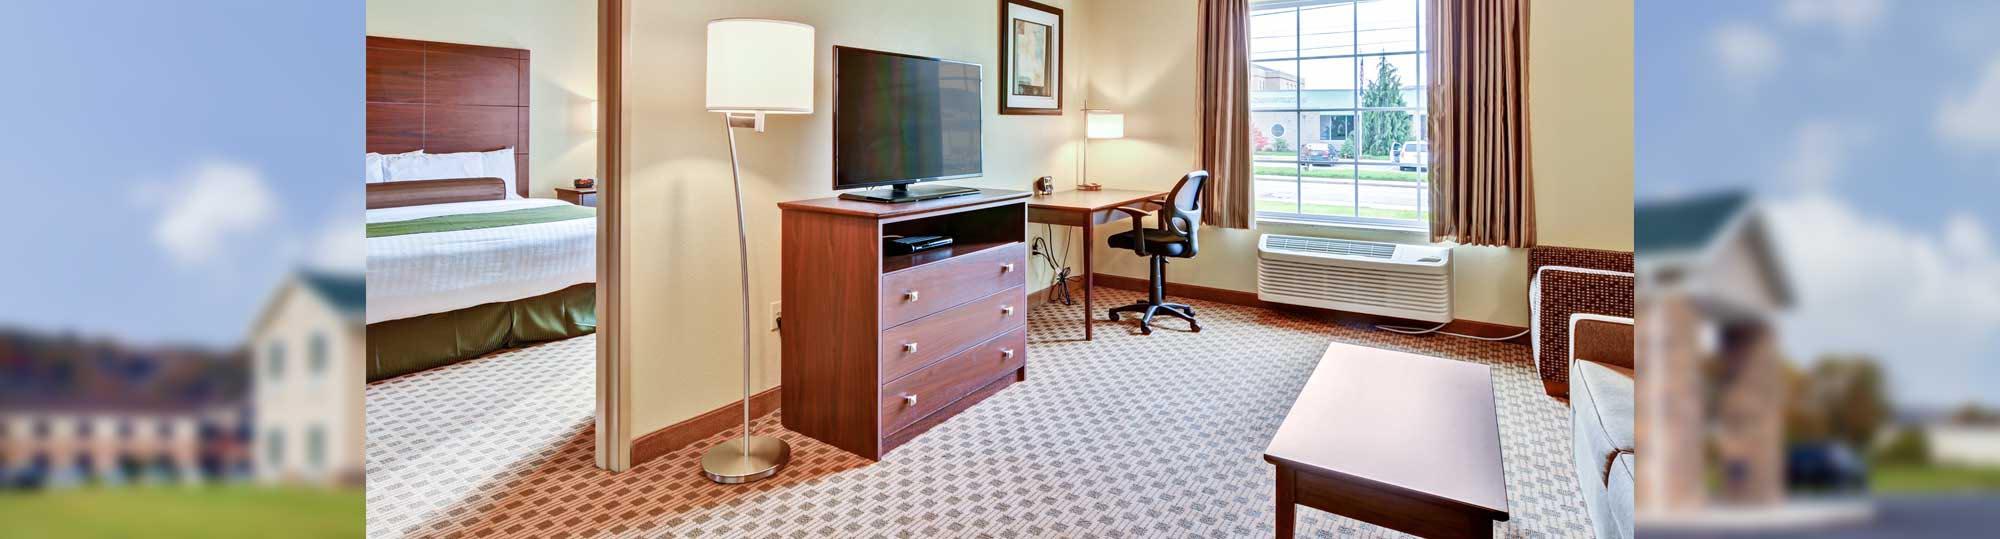 Cobblestone Inn and Suites Ambridge